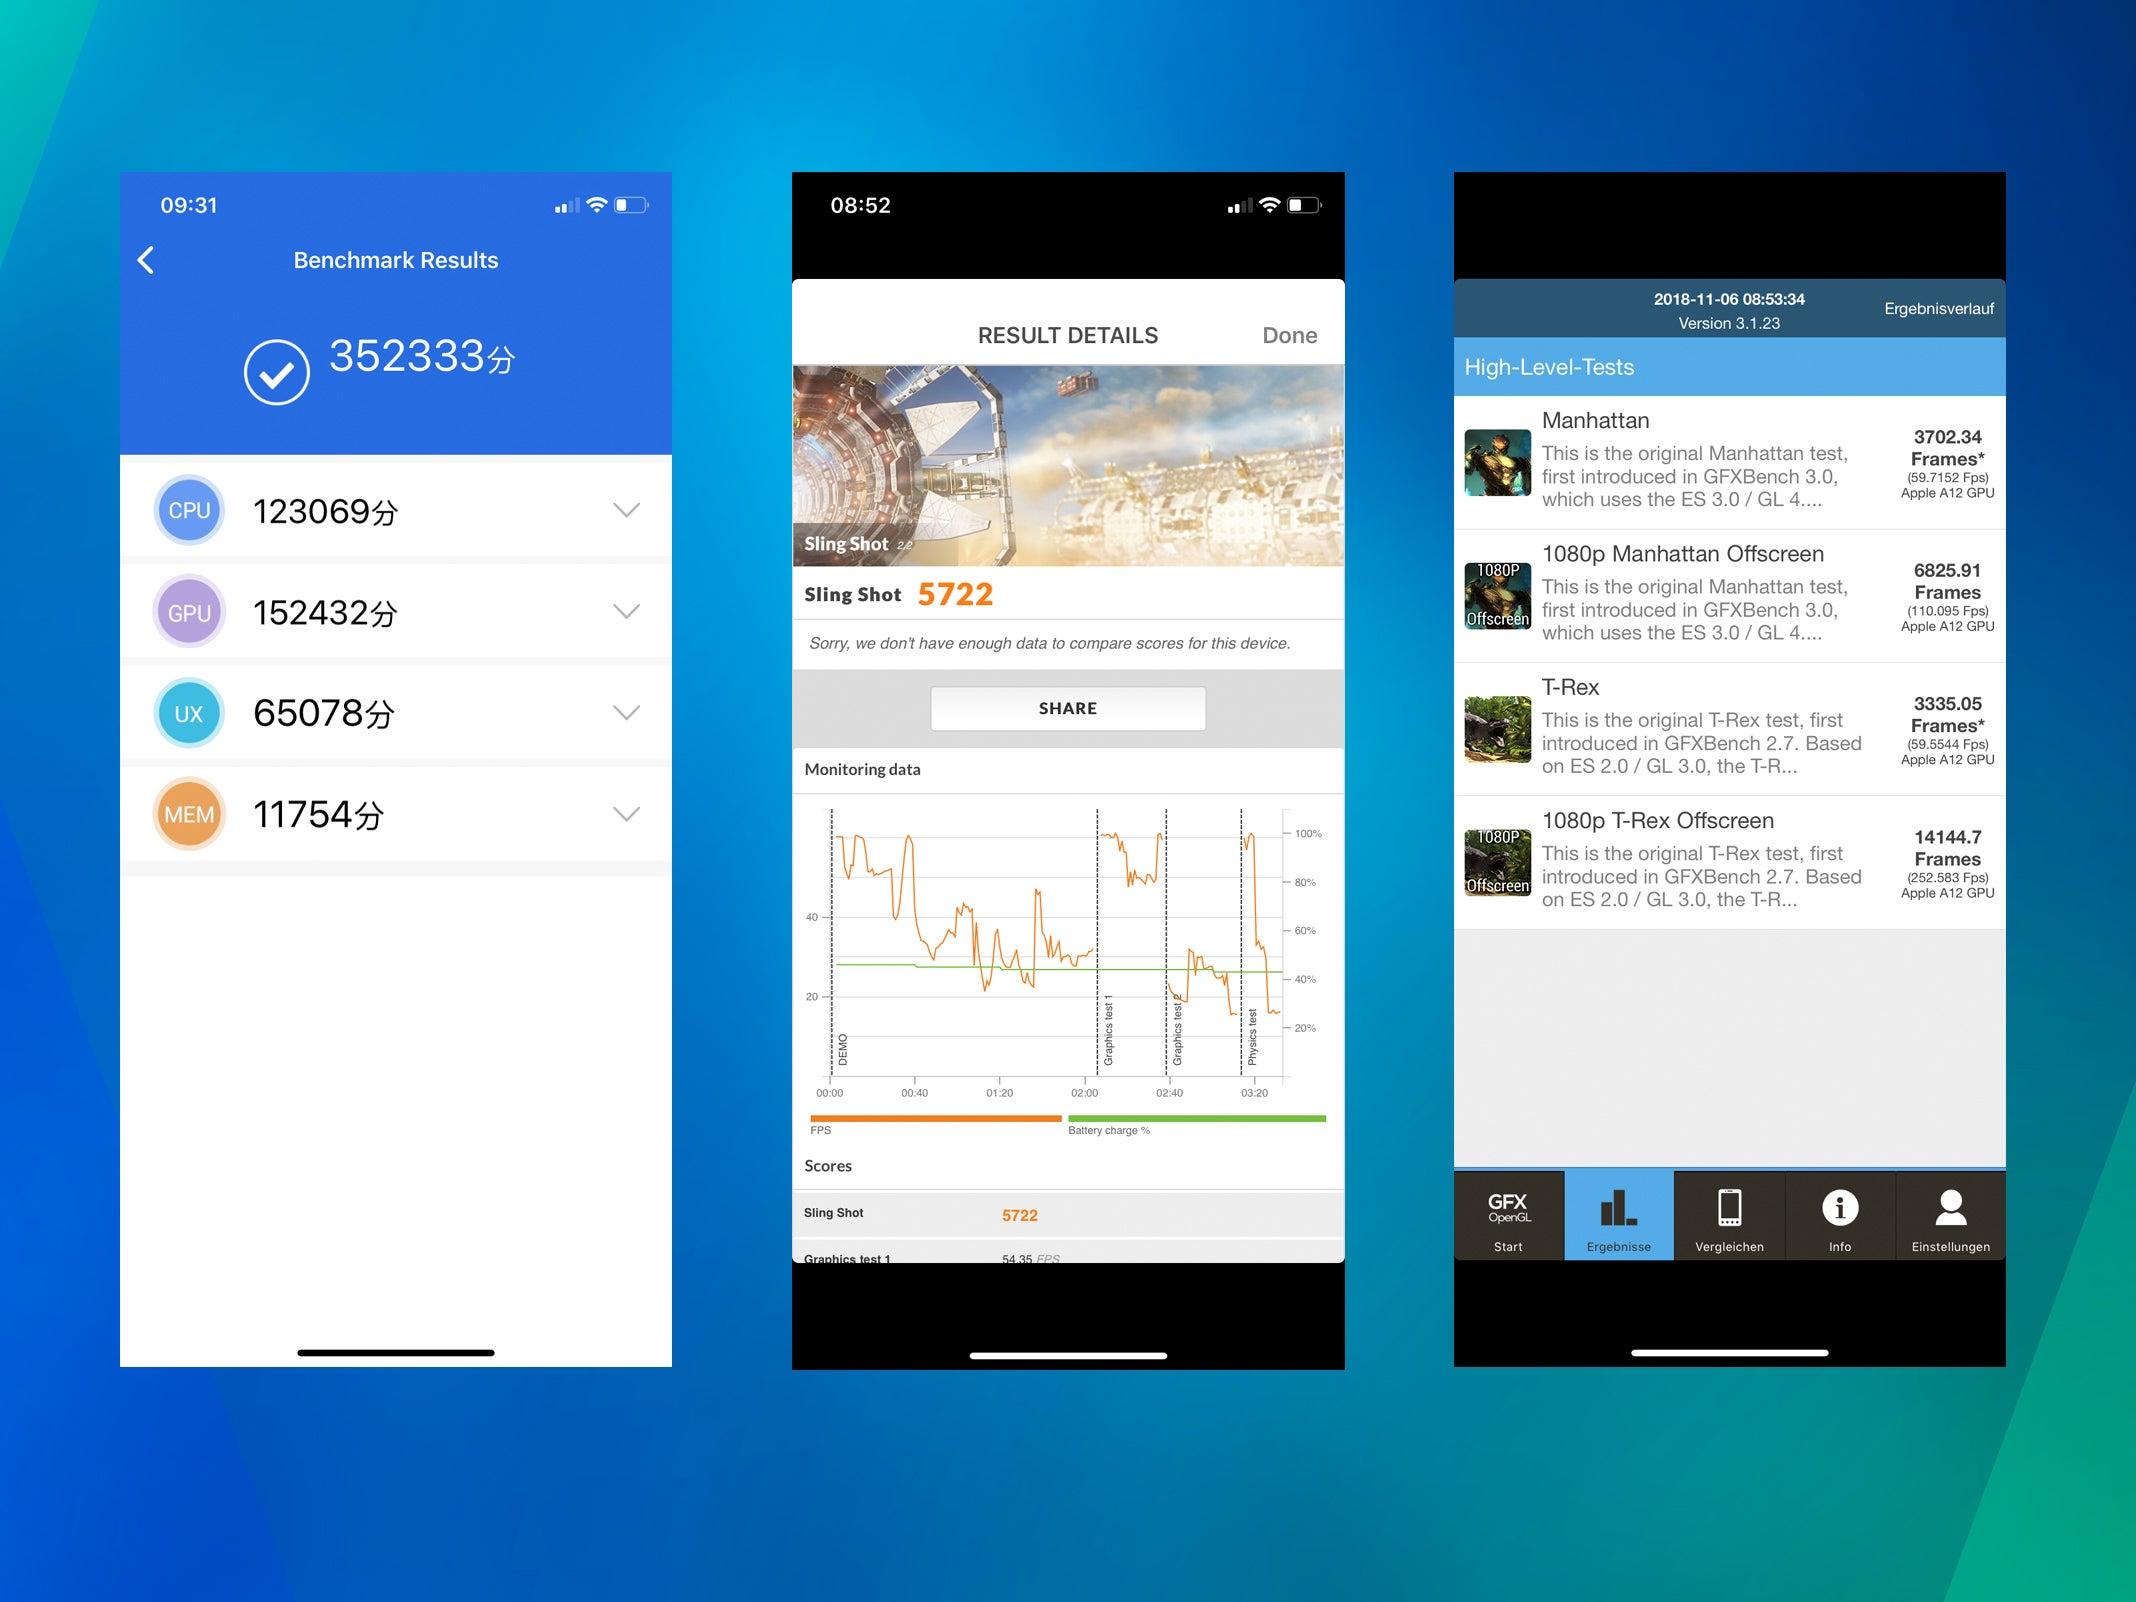 Benchmark-Testergebnisse des iPhone XR